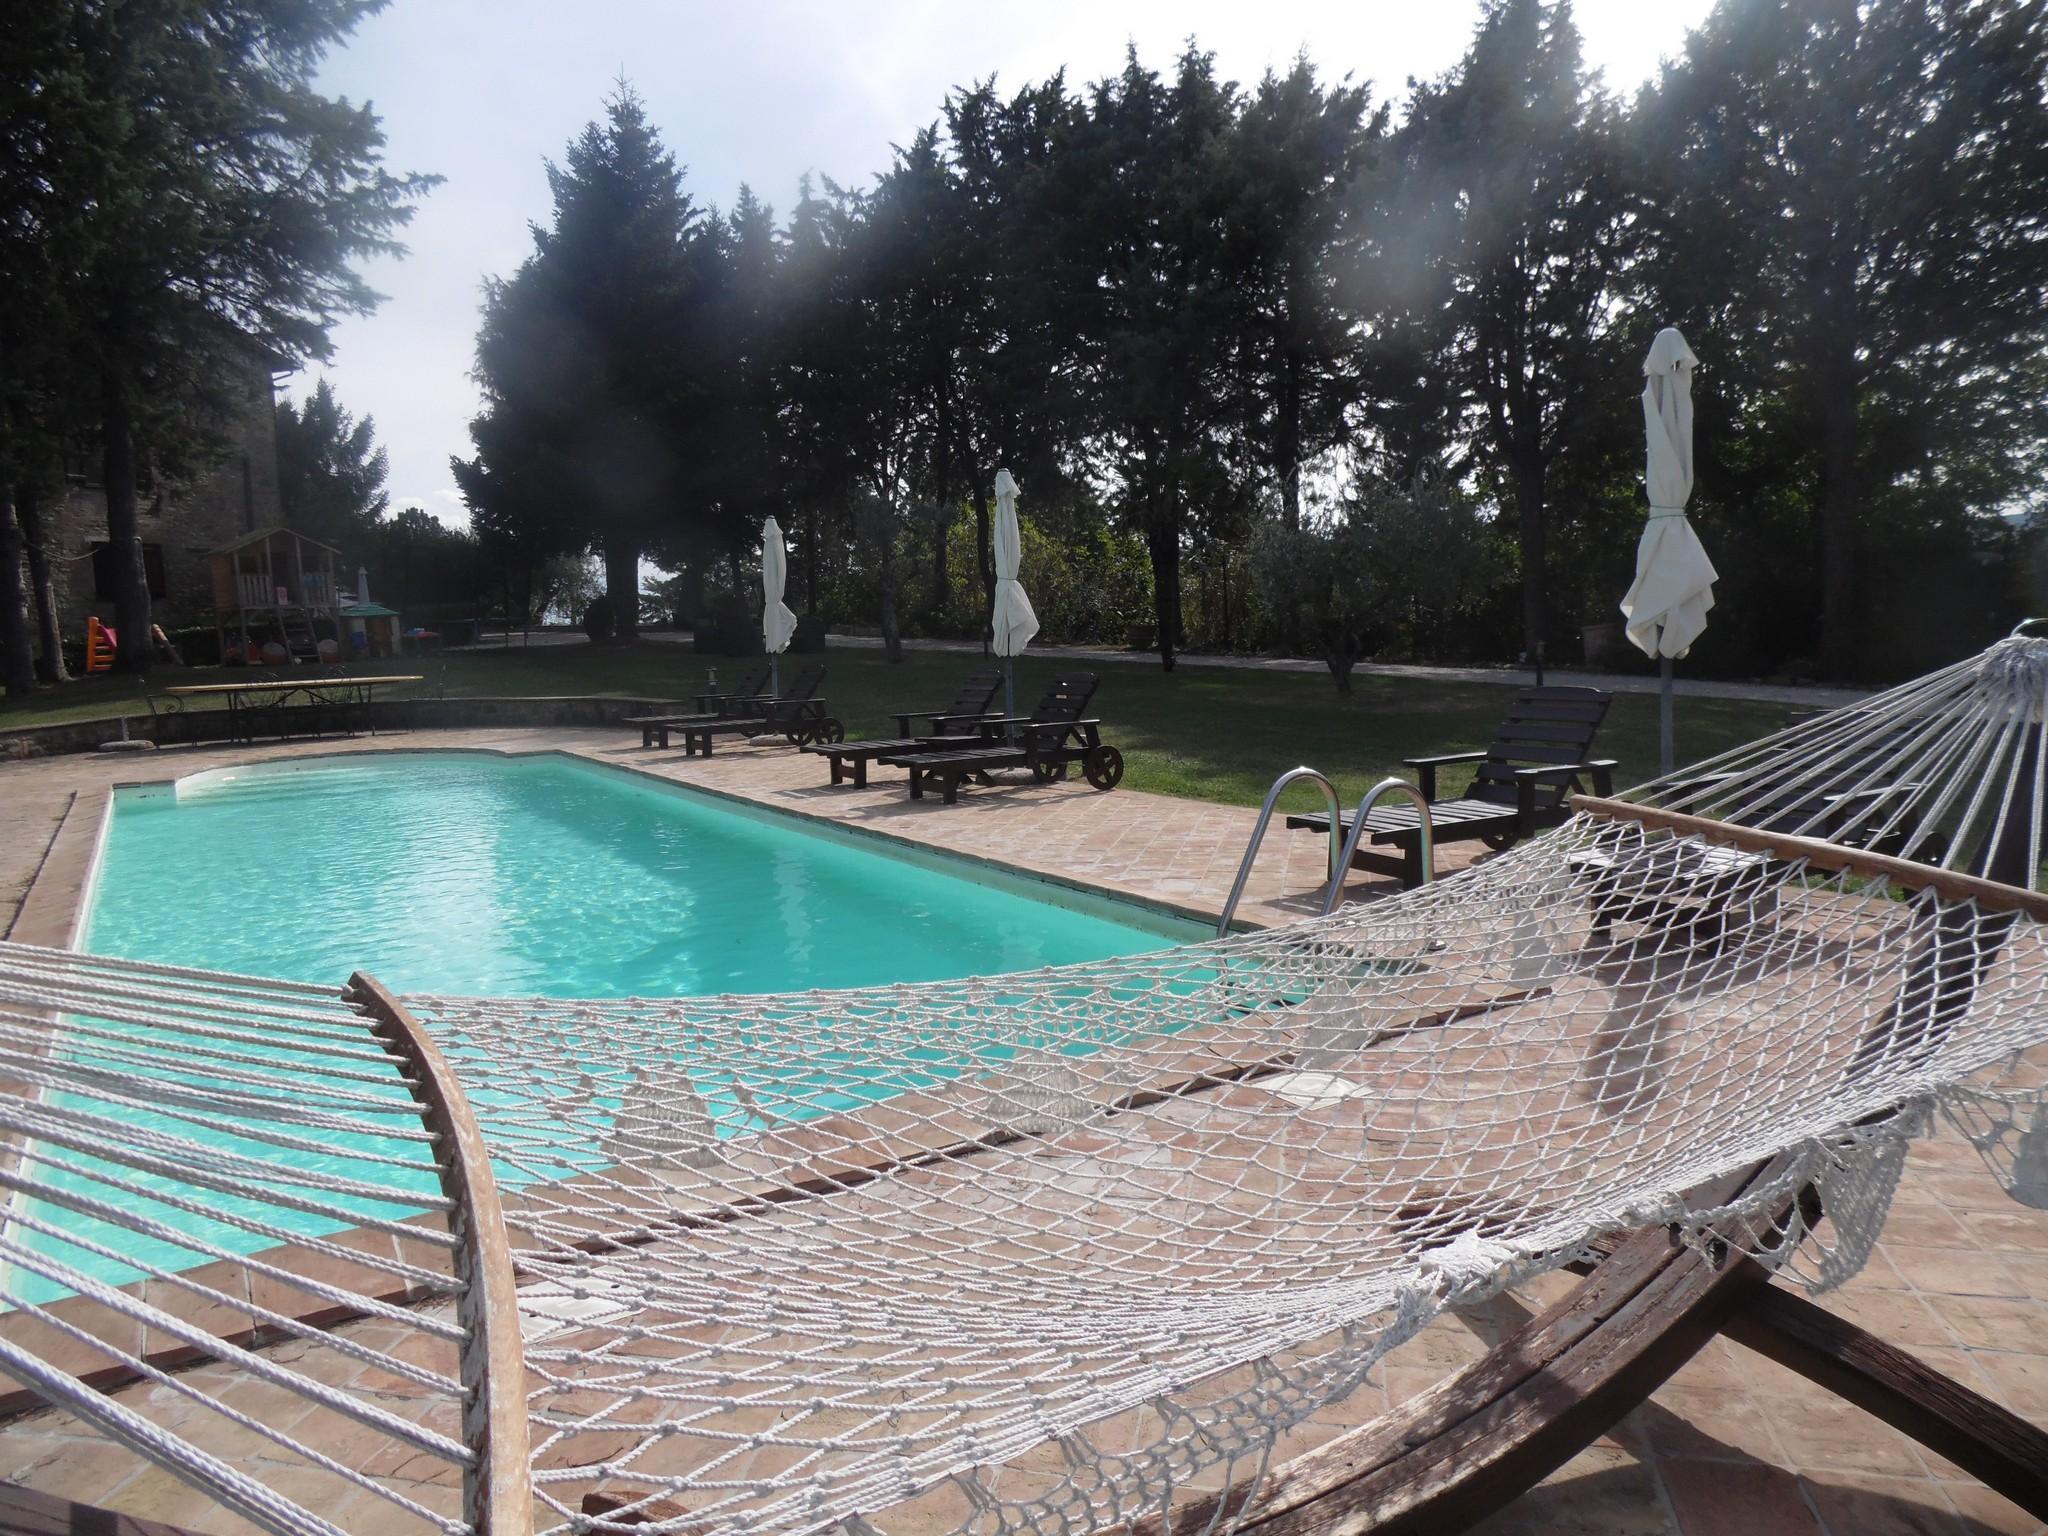 Villa Casolare Perugia, close to Gubbio and Assisi, with panoramic pool !!!